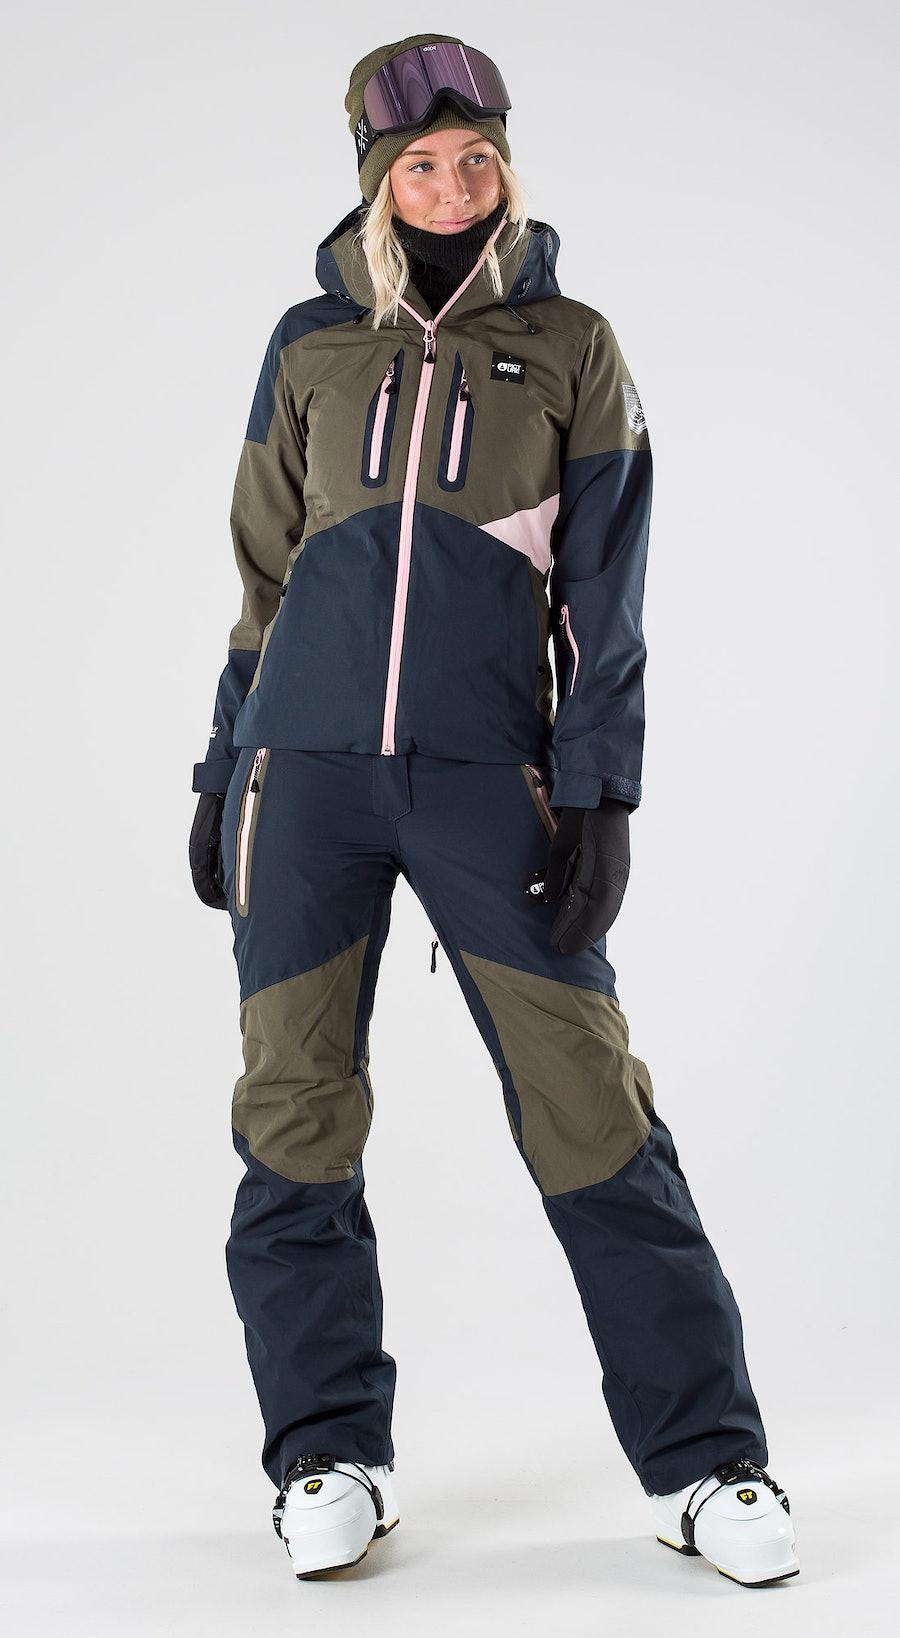 Picture Seen Dark Army Green Ski clothing Multi